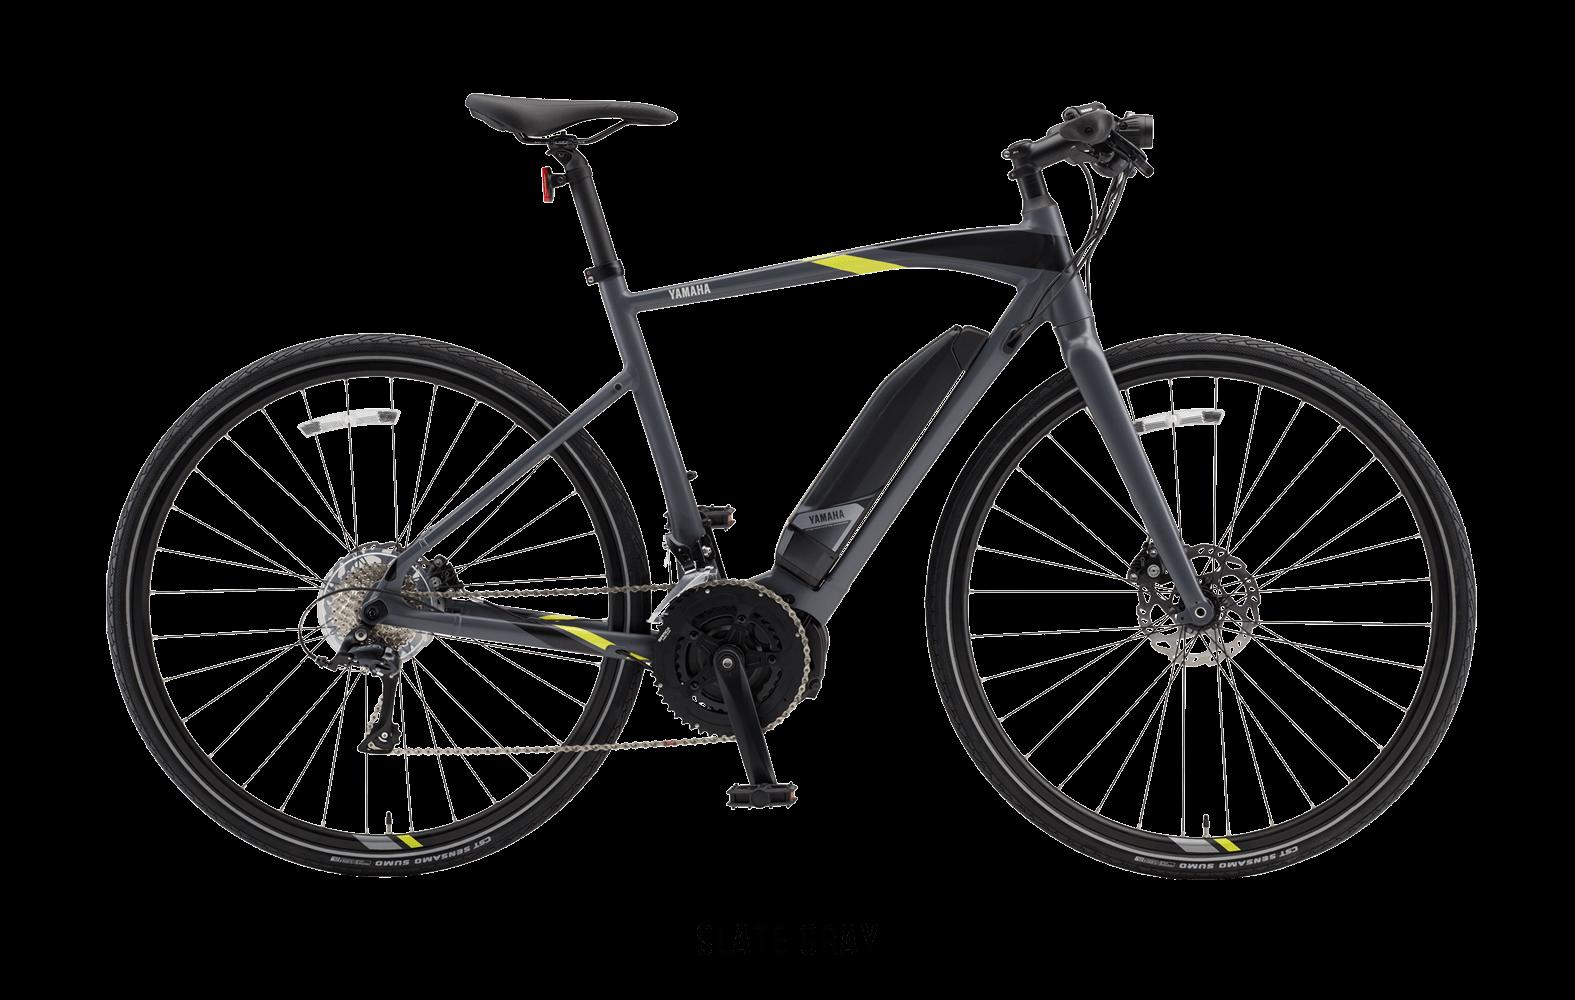 electric bike cross core yamaha e bikes. Black Bedroom Furniture Sets. Home Design Ideas